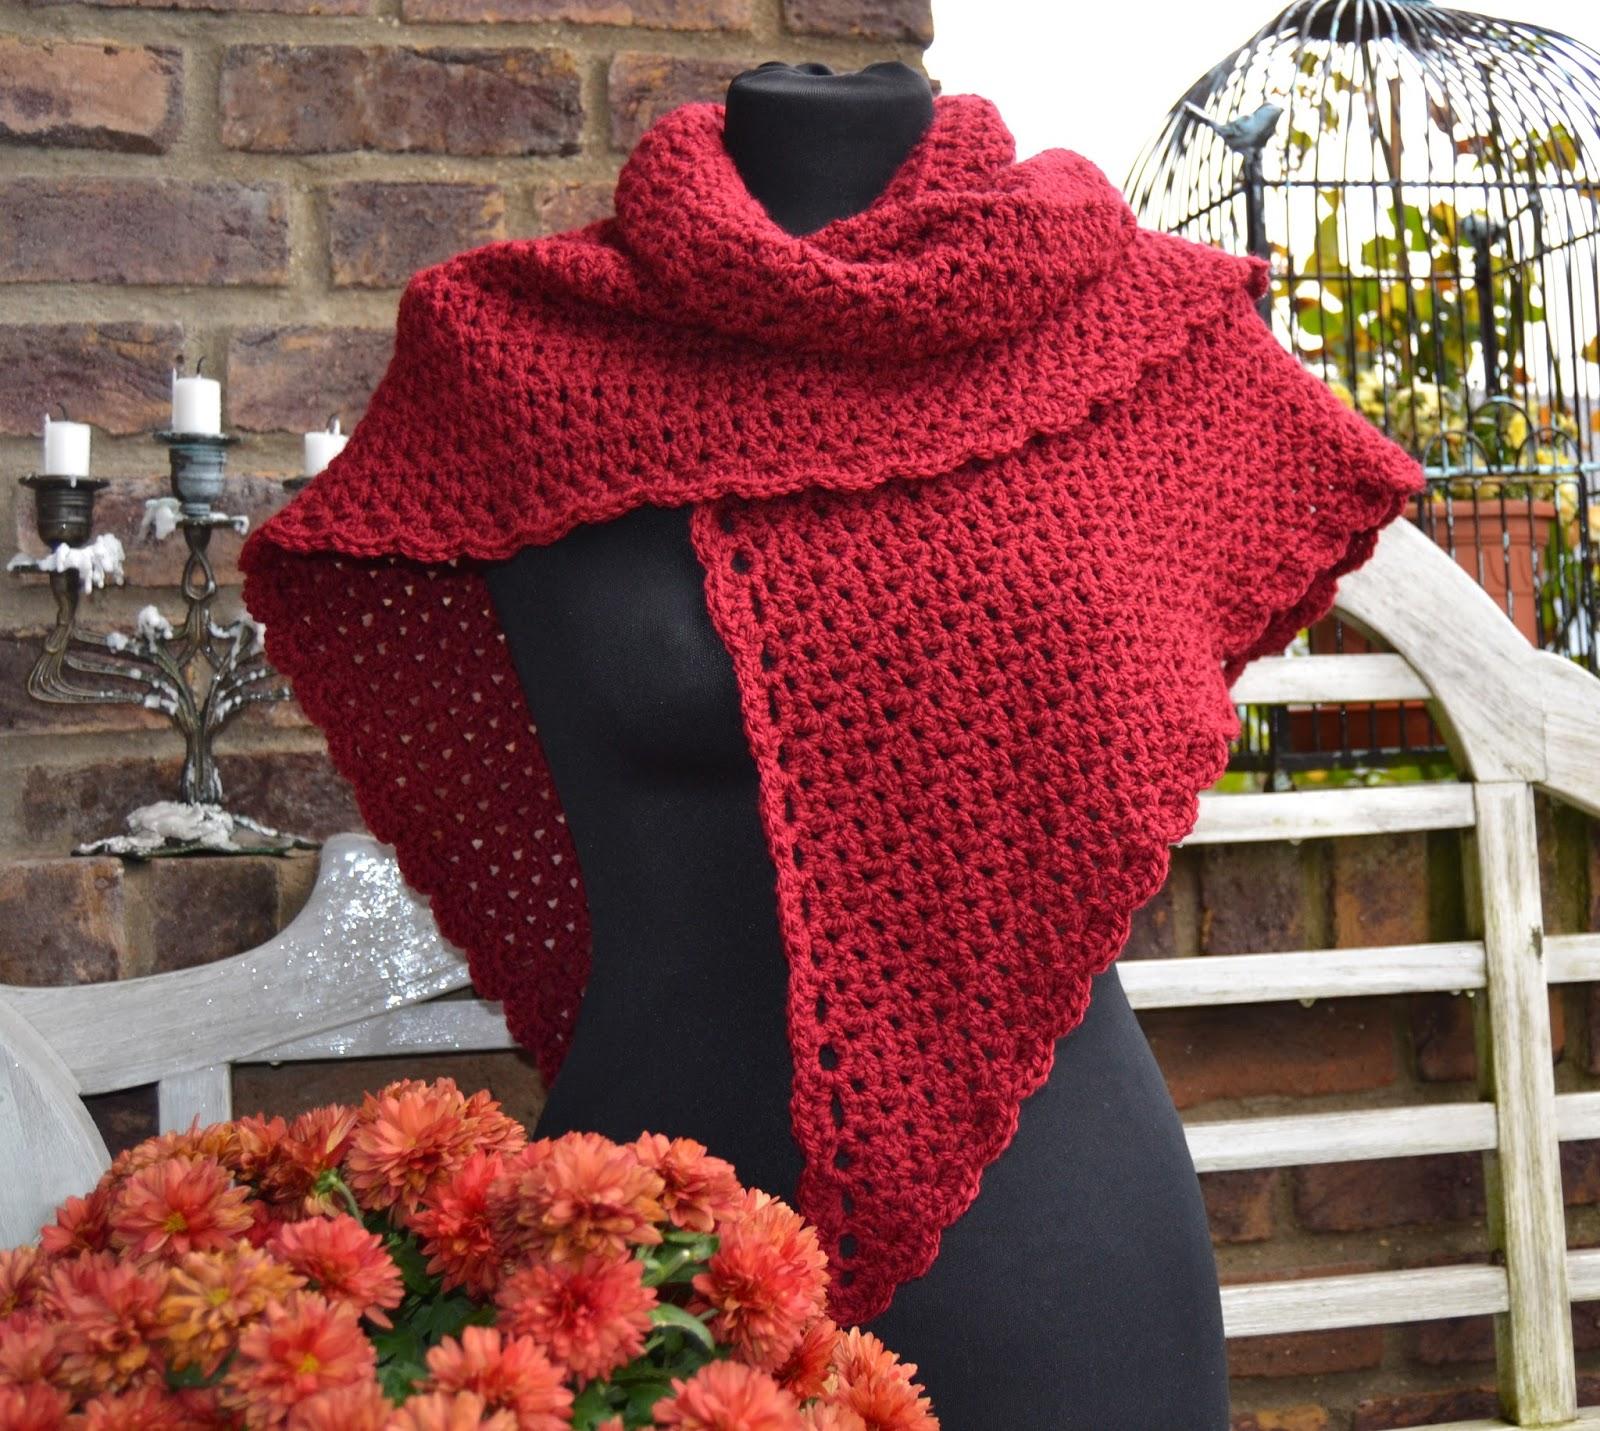 dorotheas shawl ein schal fr dorothea - Muster Fur Dreieckstuch